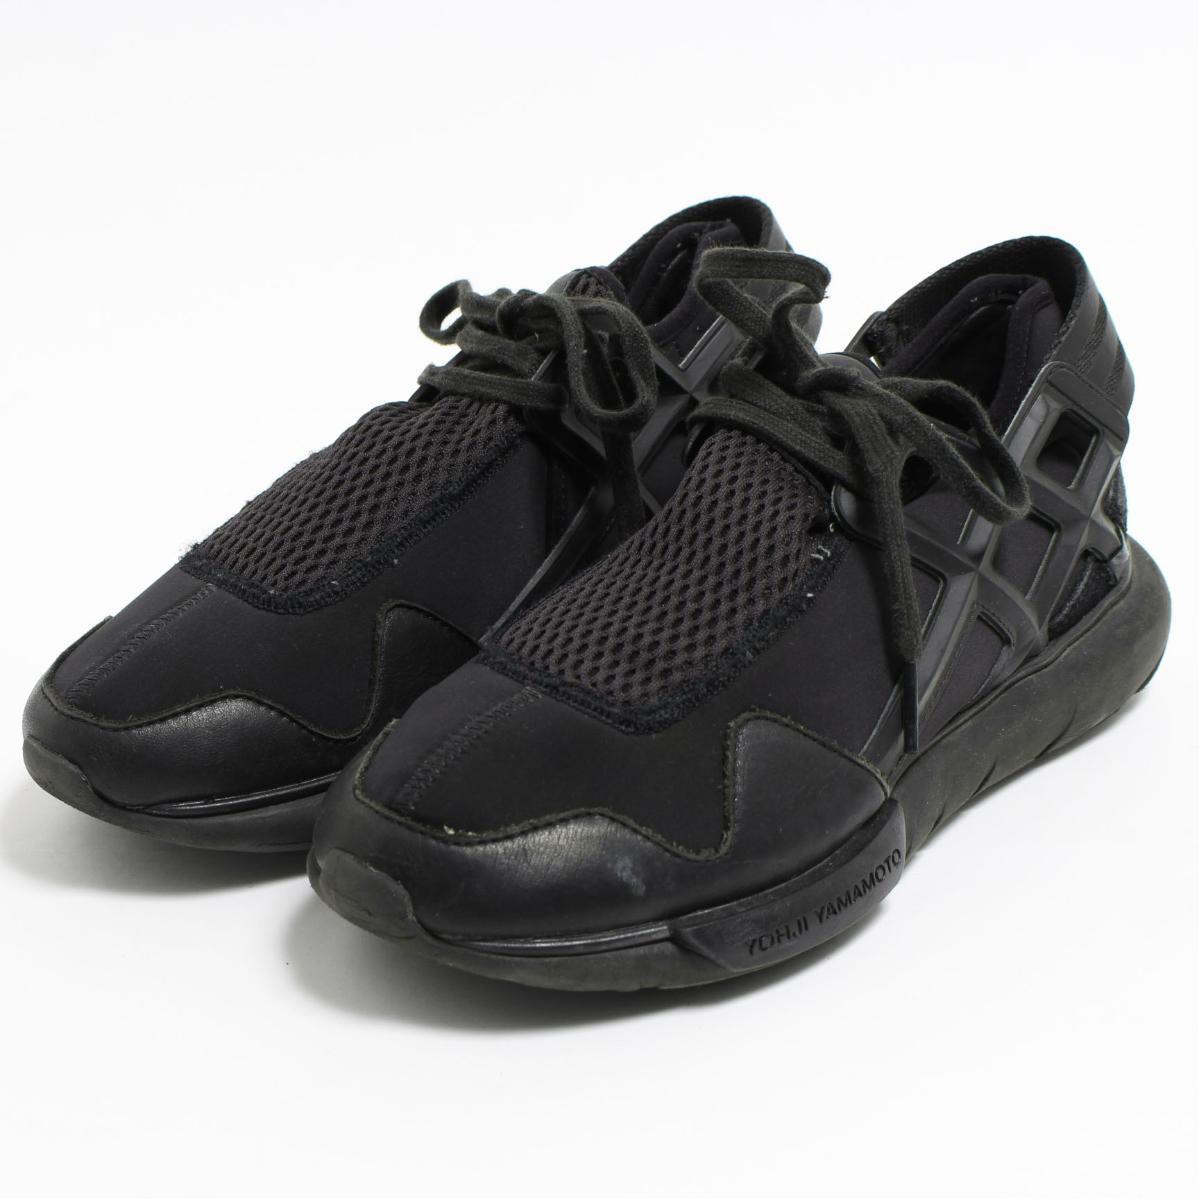 099aba245 Adidas adidas X Yohji Yamamoto Y-3 Qasa Racer sneakers US6.5 Lady s 24.5cm   boo7437